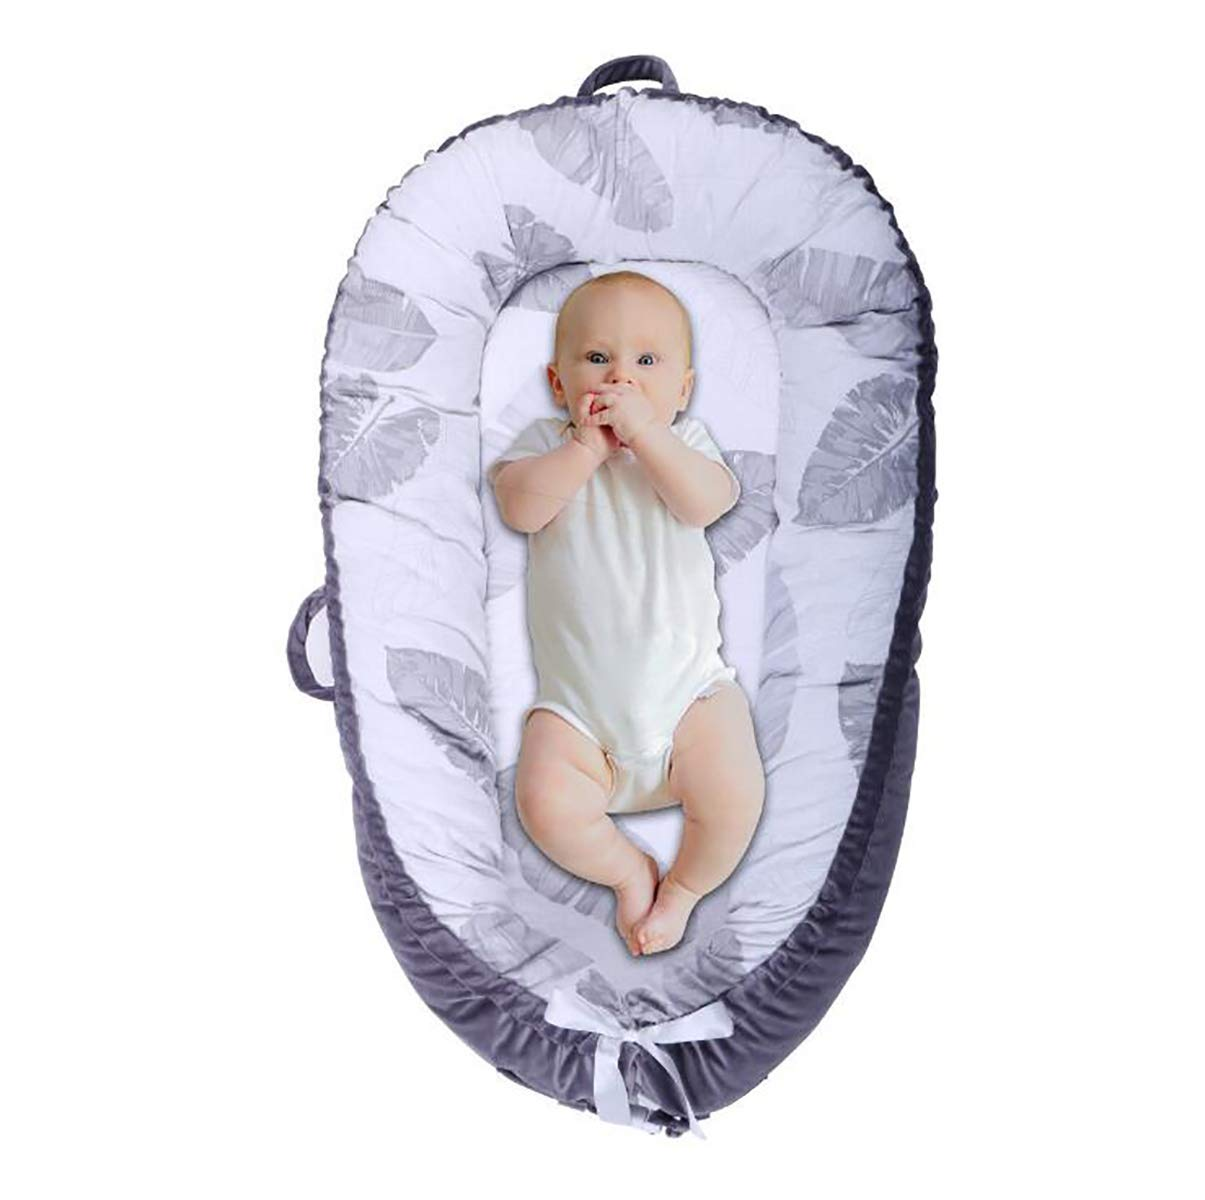 HUANZI Baby Nest Nido bebé Reductor De Cuna Reversible CóModa Cama De Nido De Bebé Nido para Franela y algodón, AntialéRgico, 80 Cm X 50 Cm, 11, ...